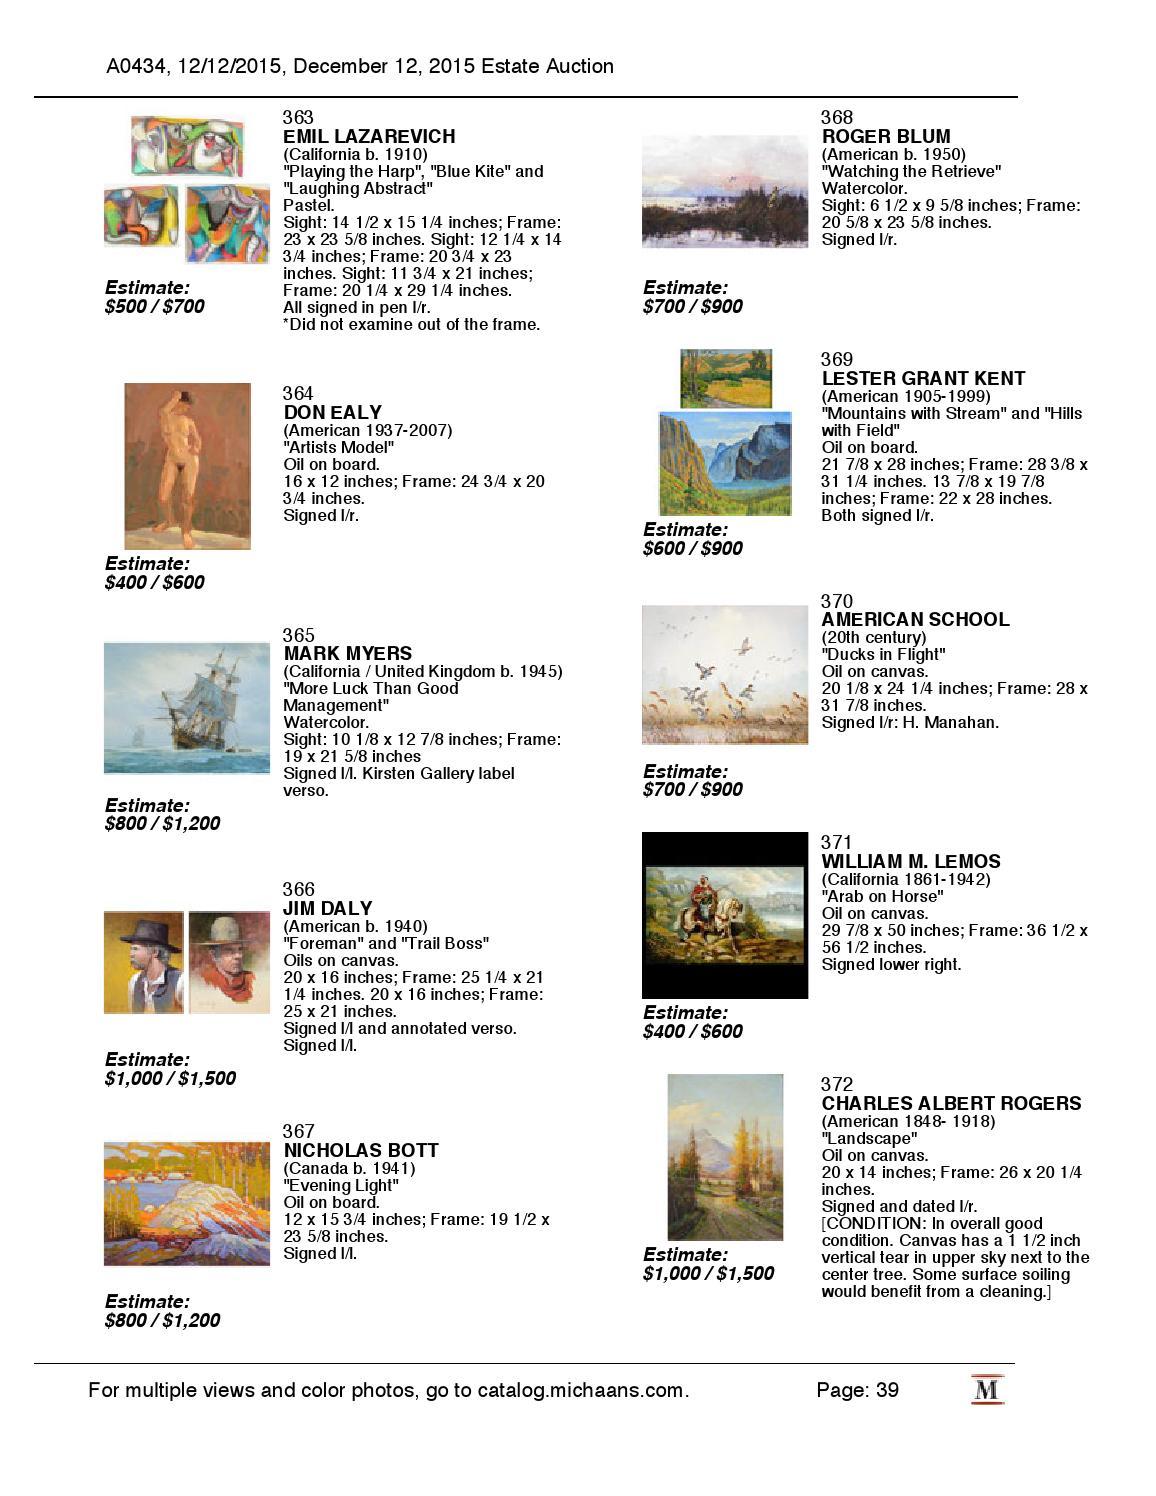 December Estate Auction Catalog By